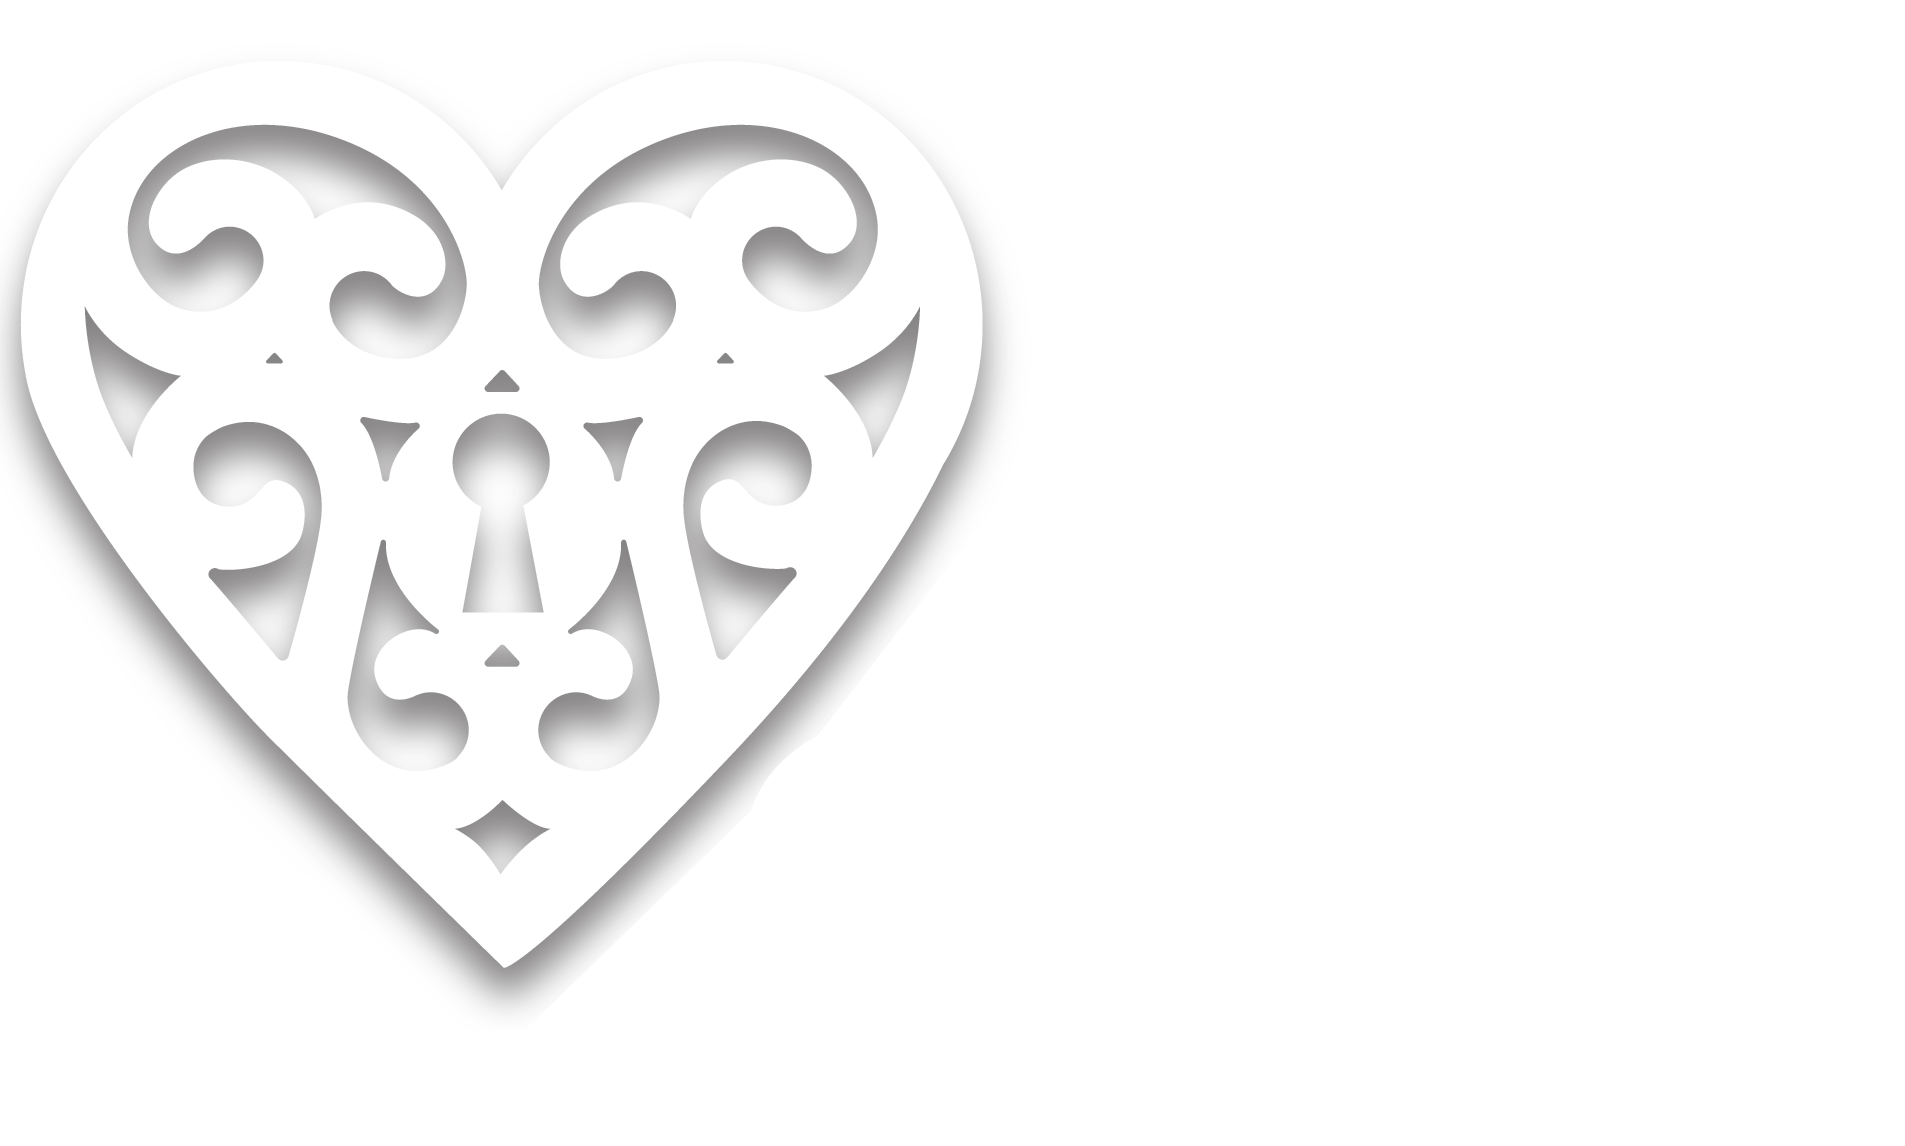 Amor Boutique Hotel Sayulita Mexico – Amor Boutique Hotel